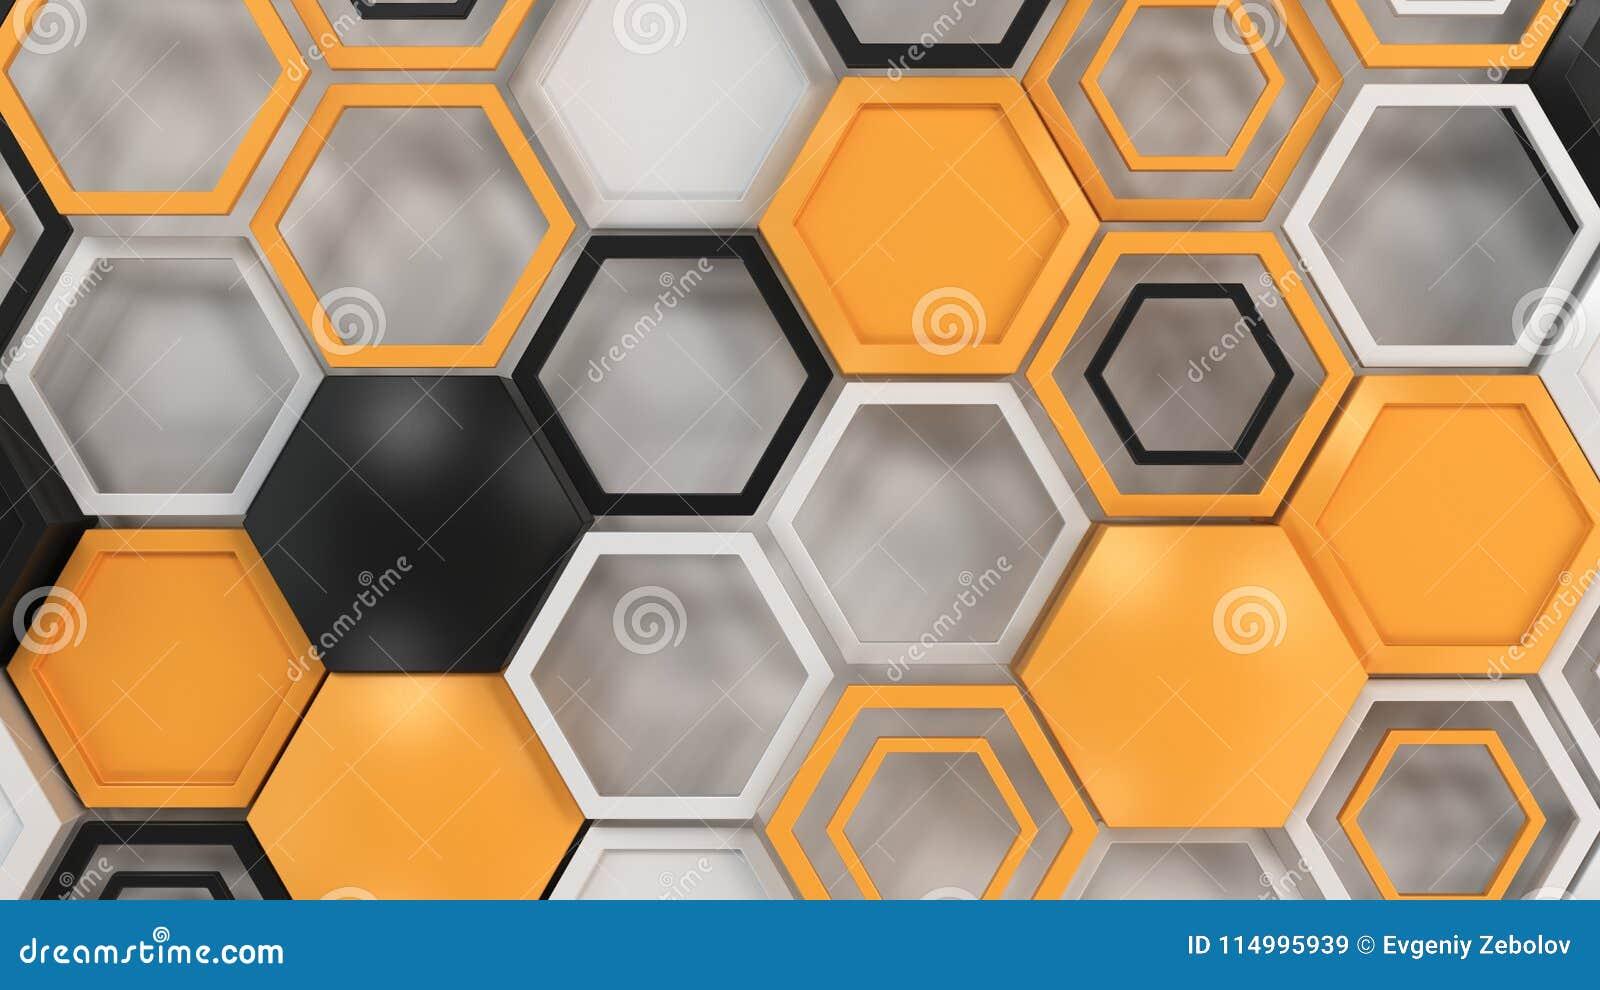 4794cbb0a Abstract background made black white orange hexagons wall honeycomb pattern  render illustration image jpg 1300x821 Black